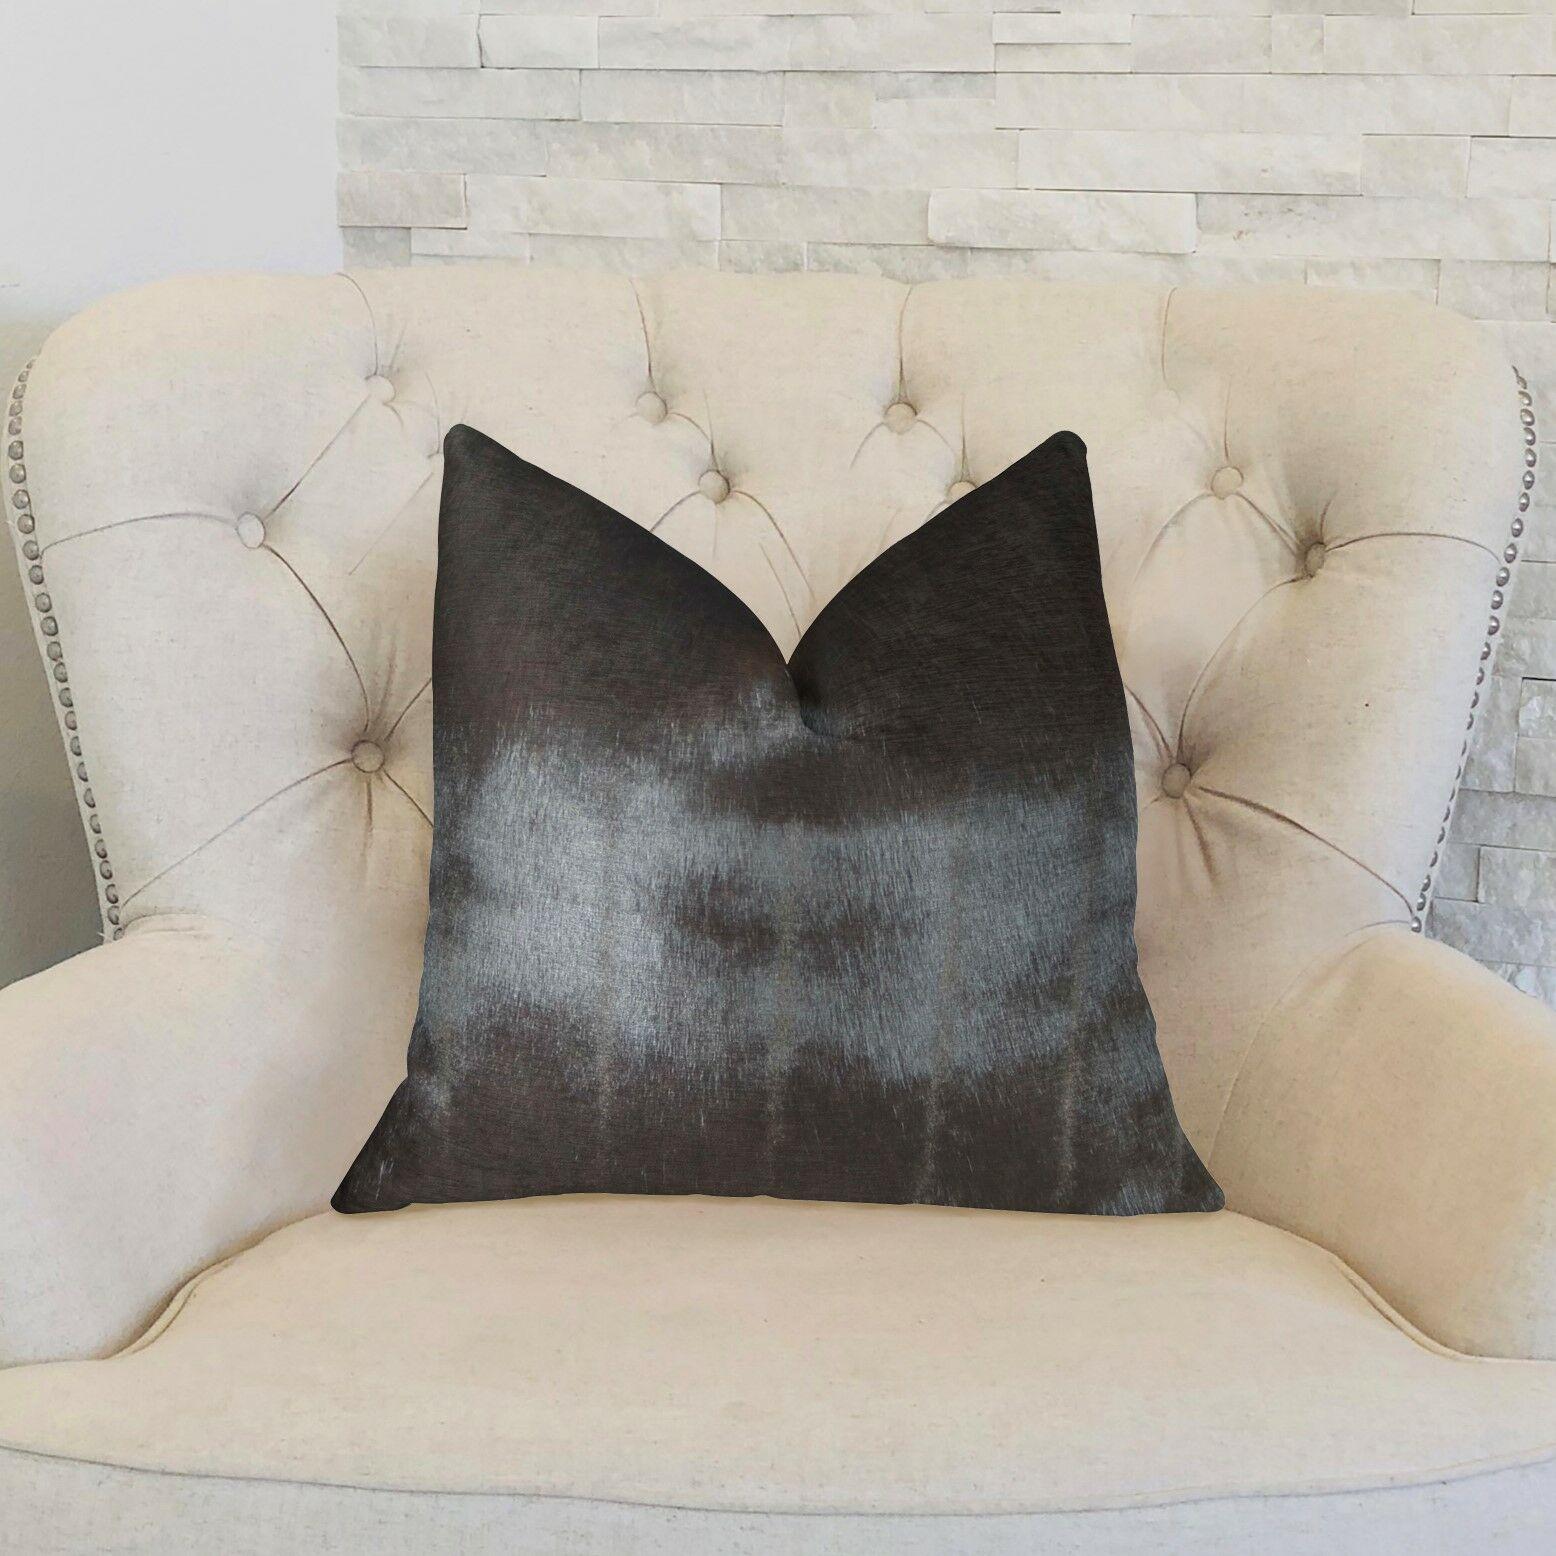 Galusha Silky Mink Handmade Luxury Pillow Size: 20